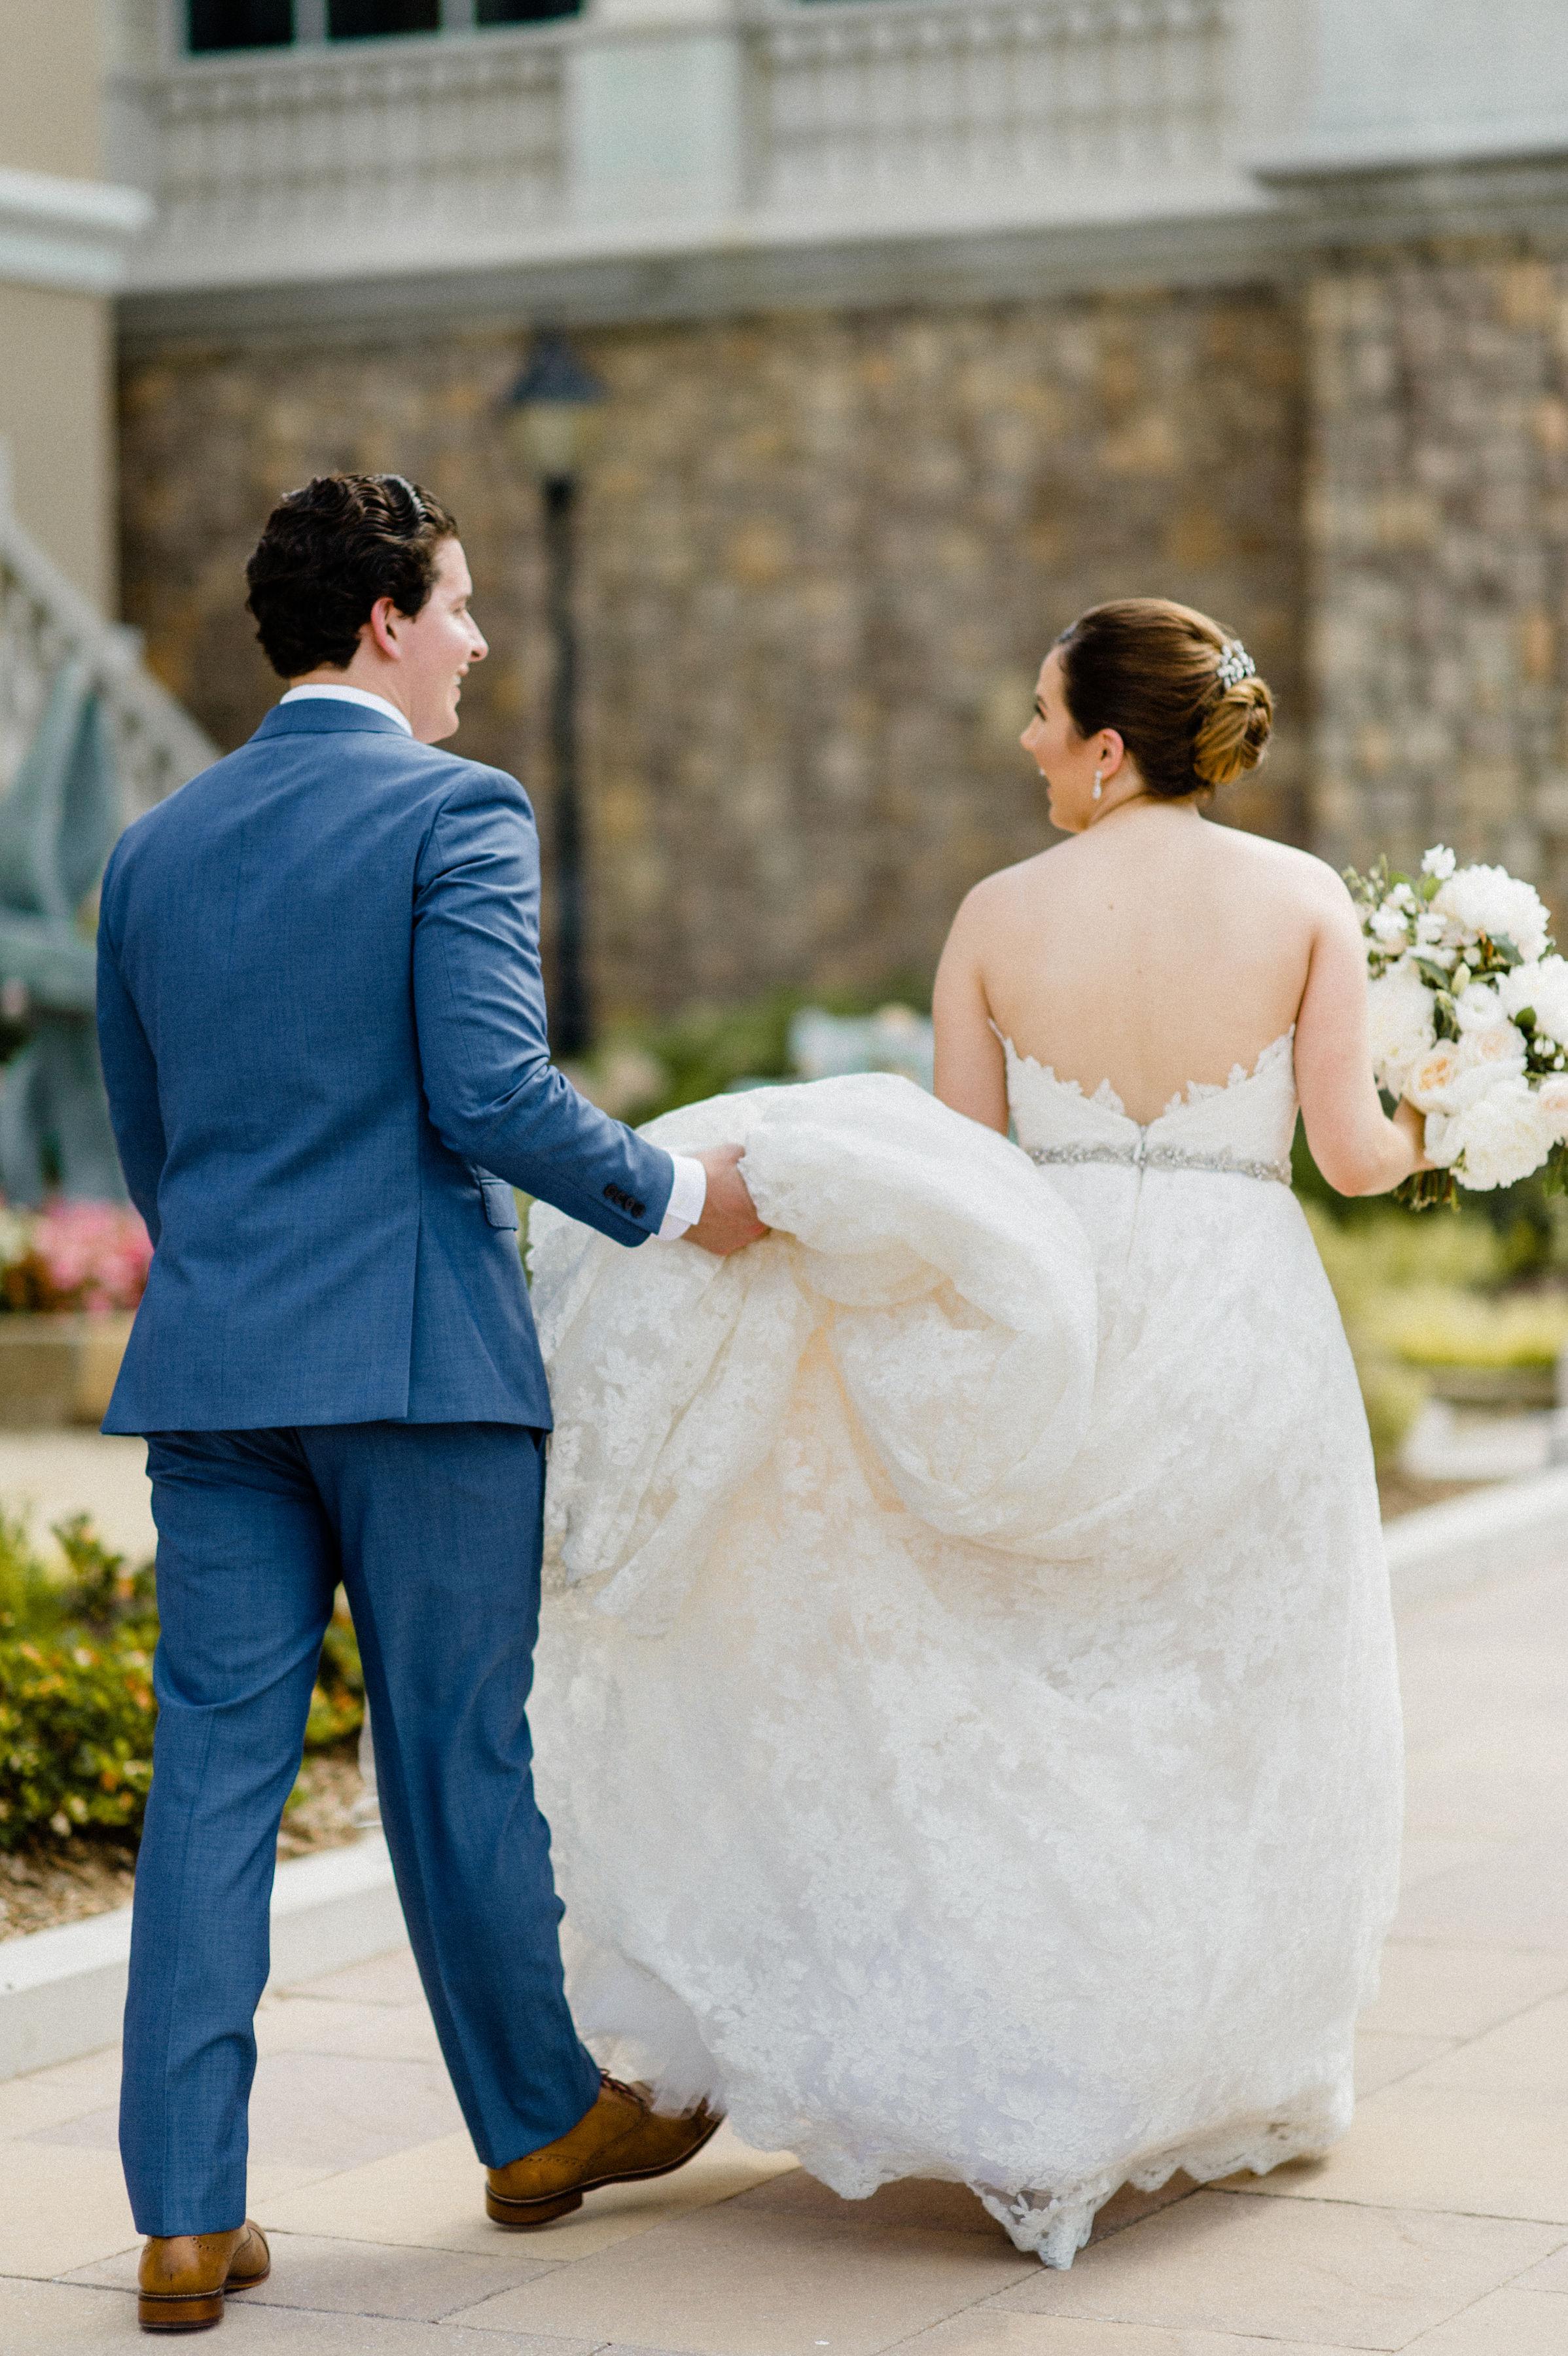 McElravey_Wedding_CarolineLimaPhotography_2018_203.jpg